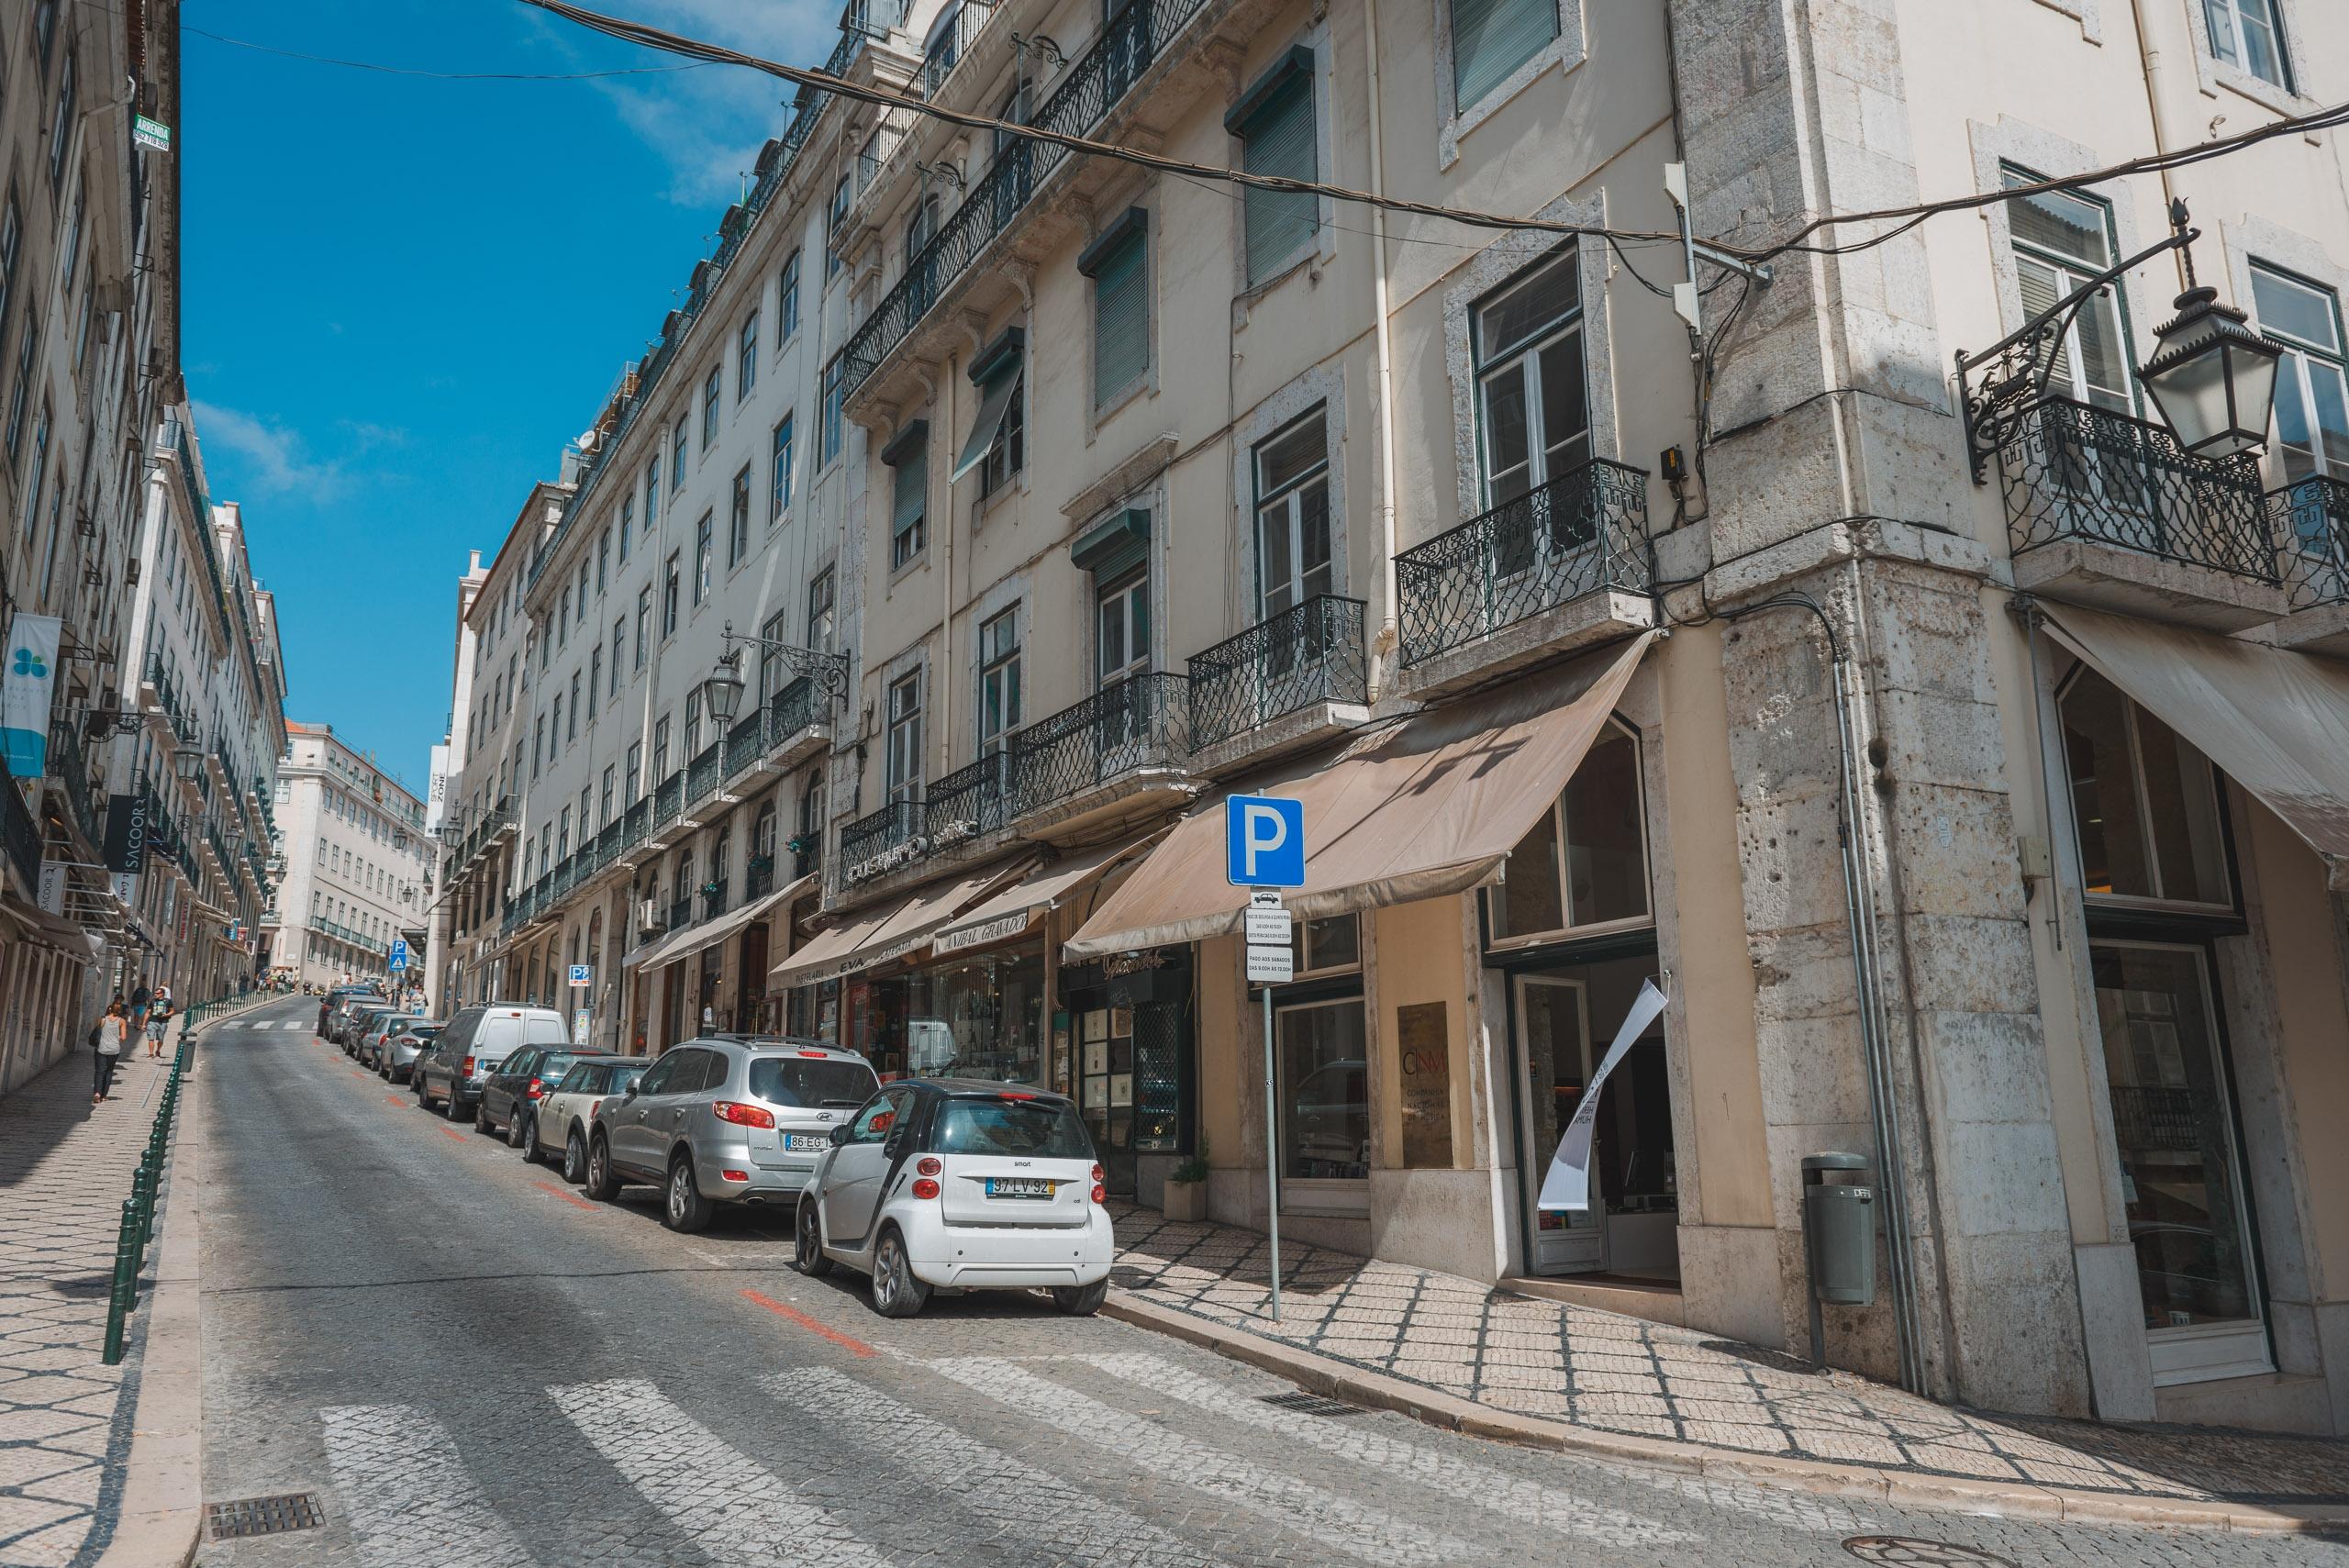 Portugal - Lisbon - 2012-0921-DSC_1343_20944